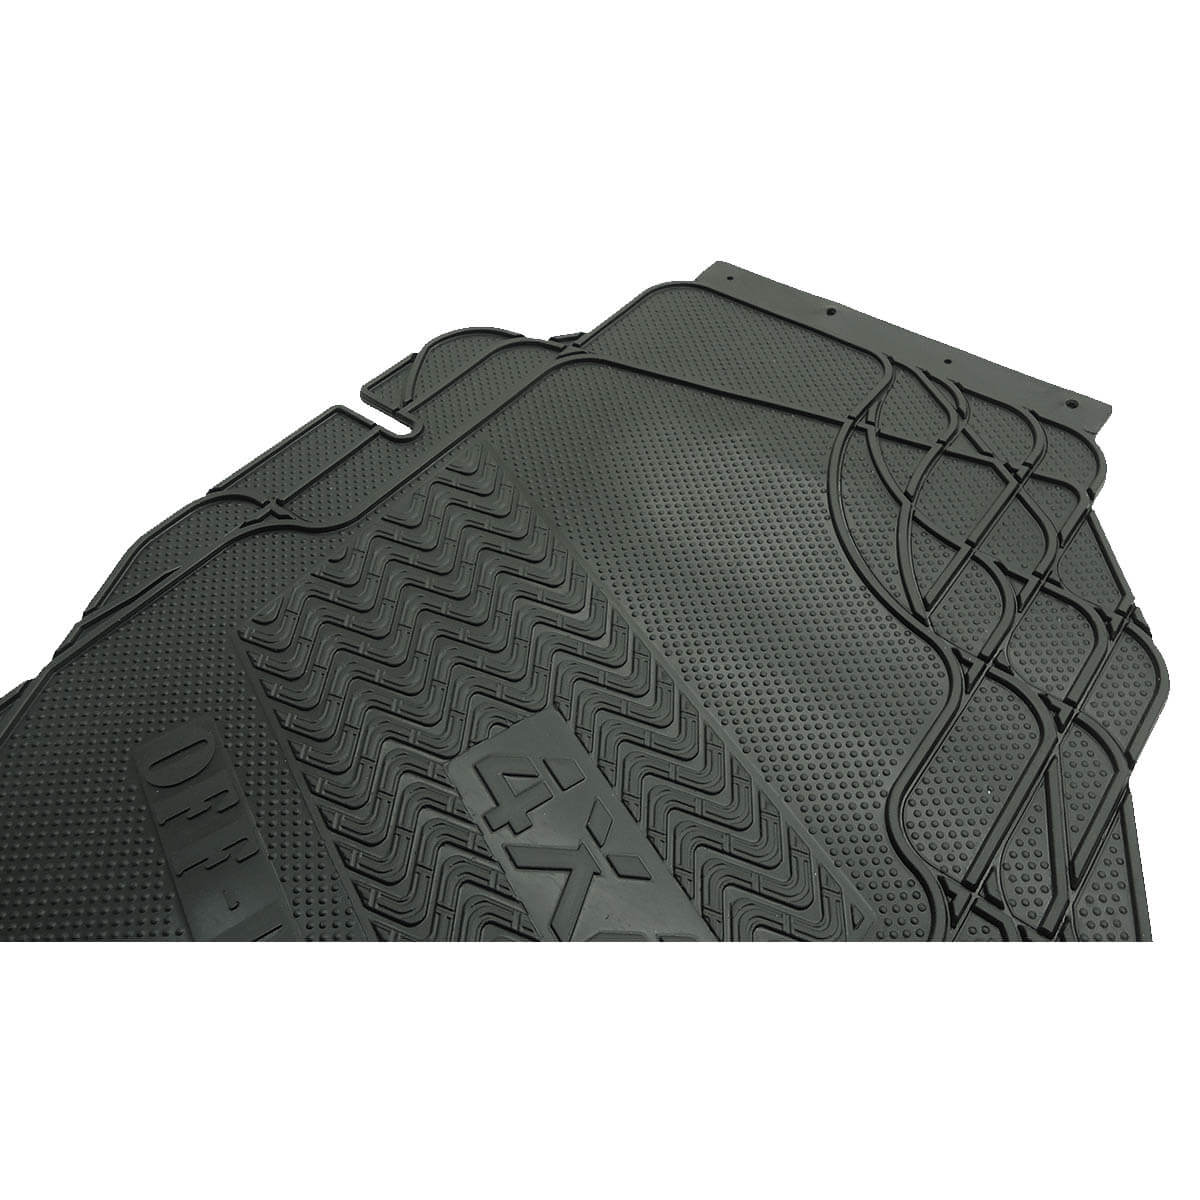 Tapete borracha PVC virgem Amarok cabine dupla 2011 a 2020